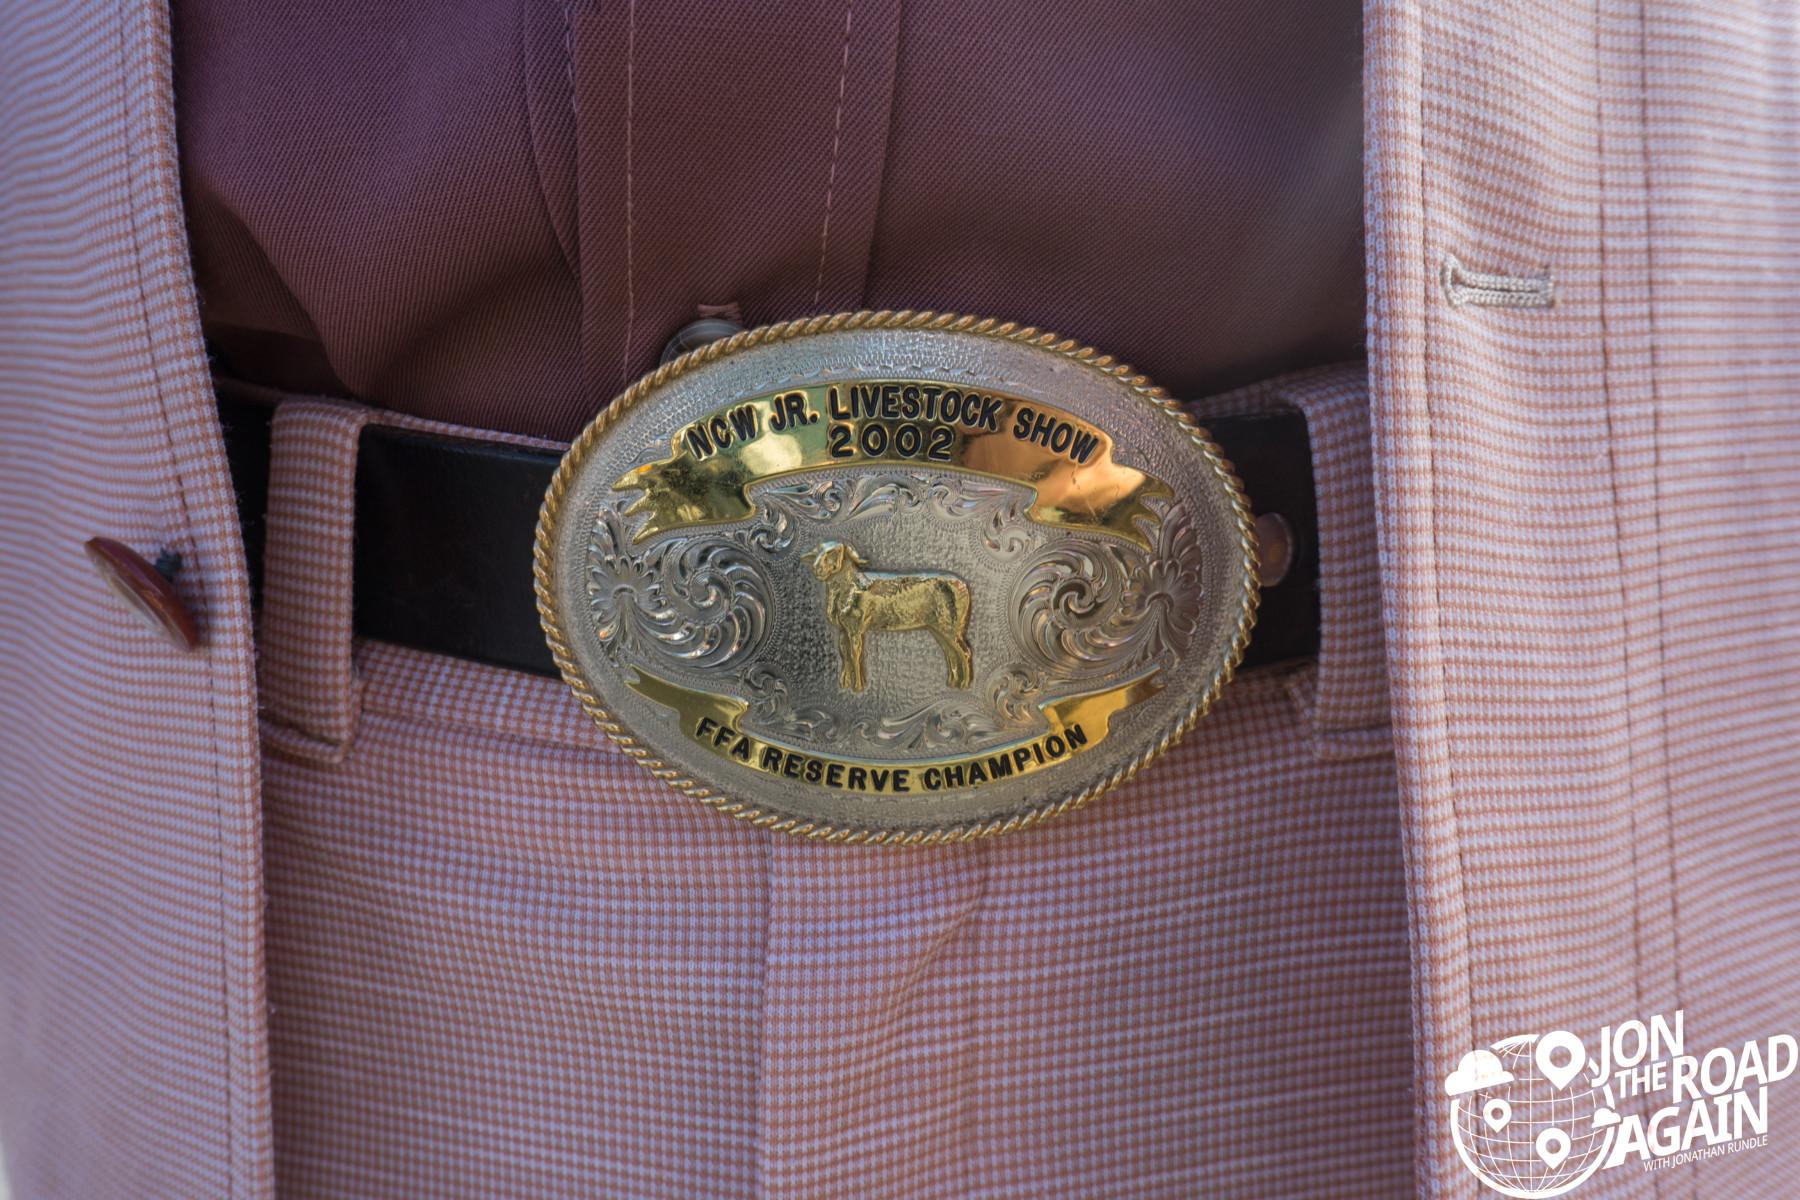 DGR belt buckle